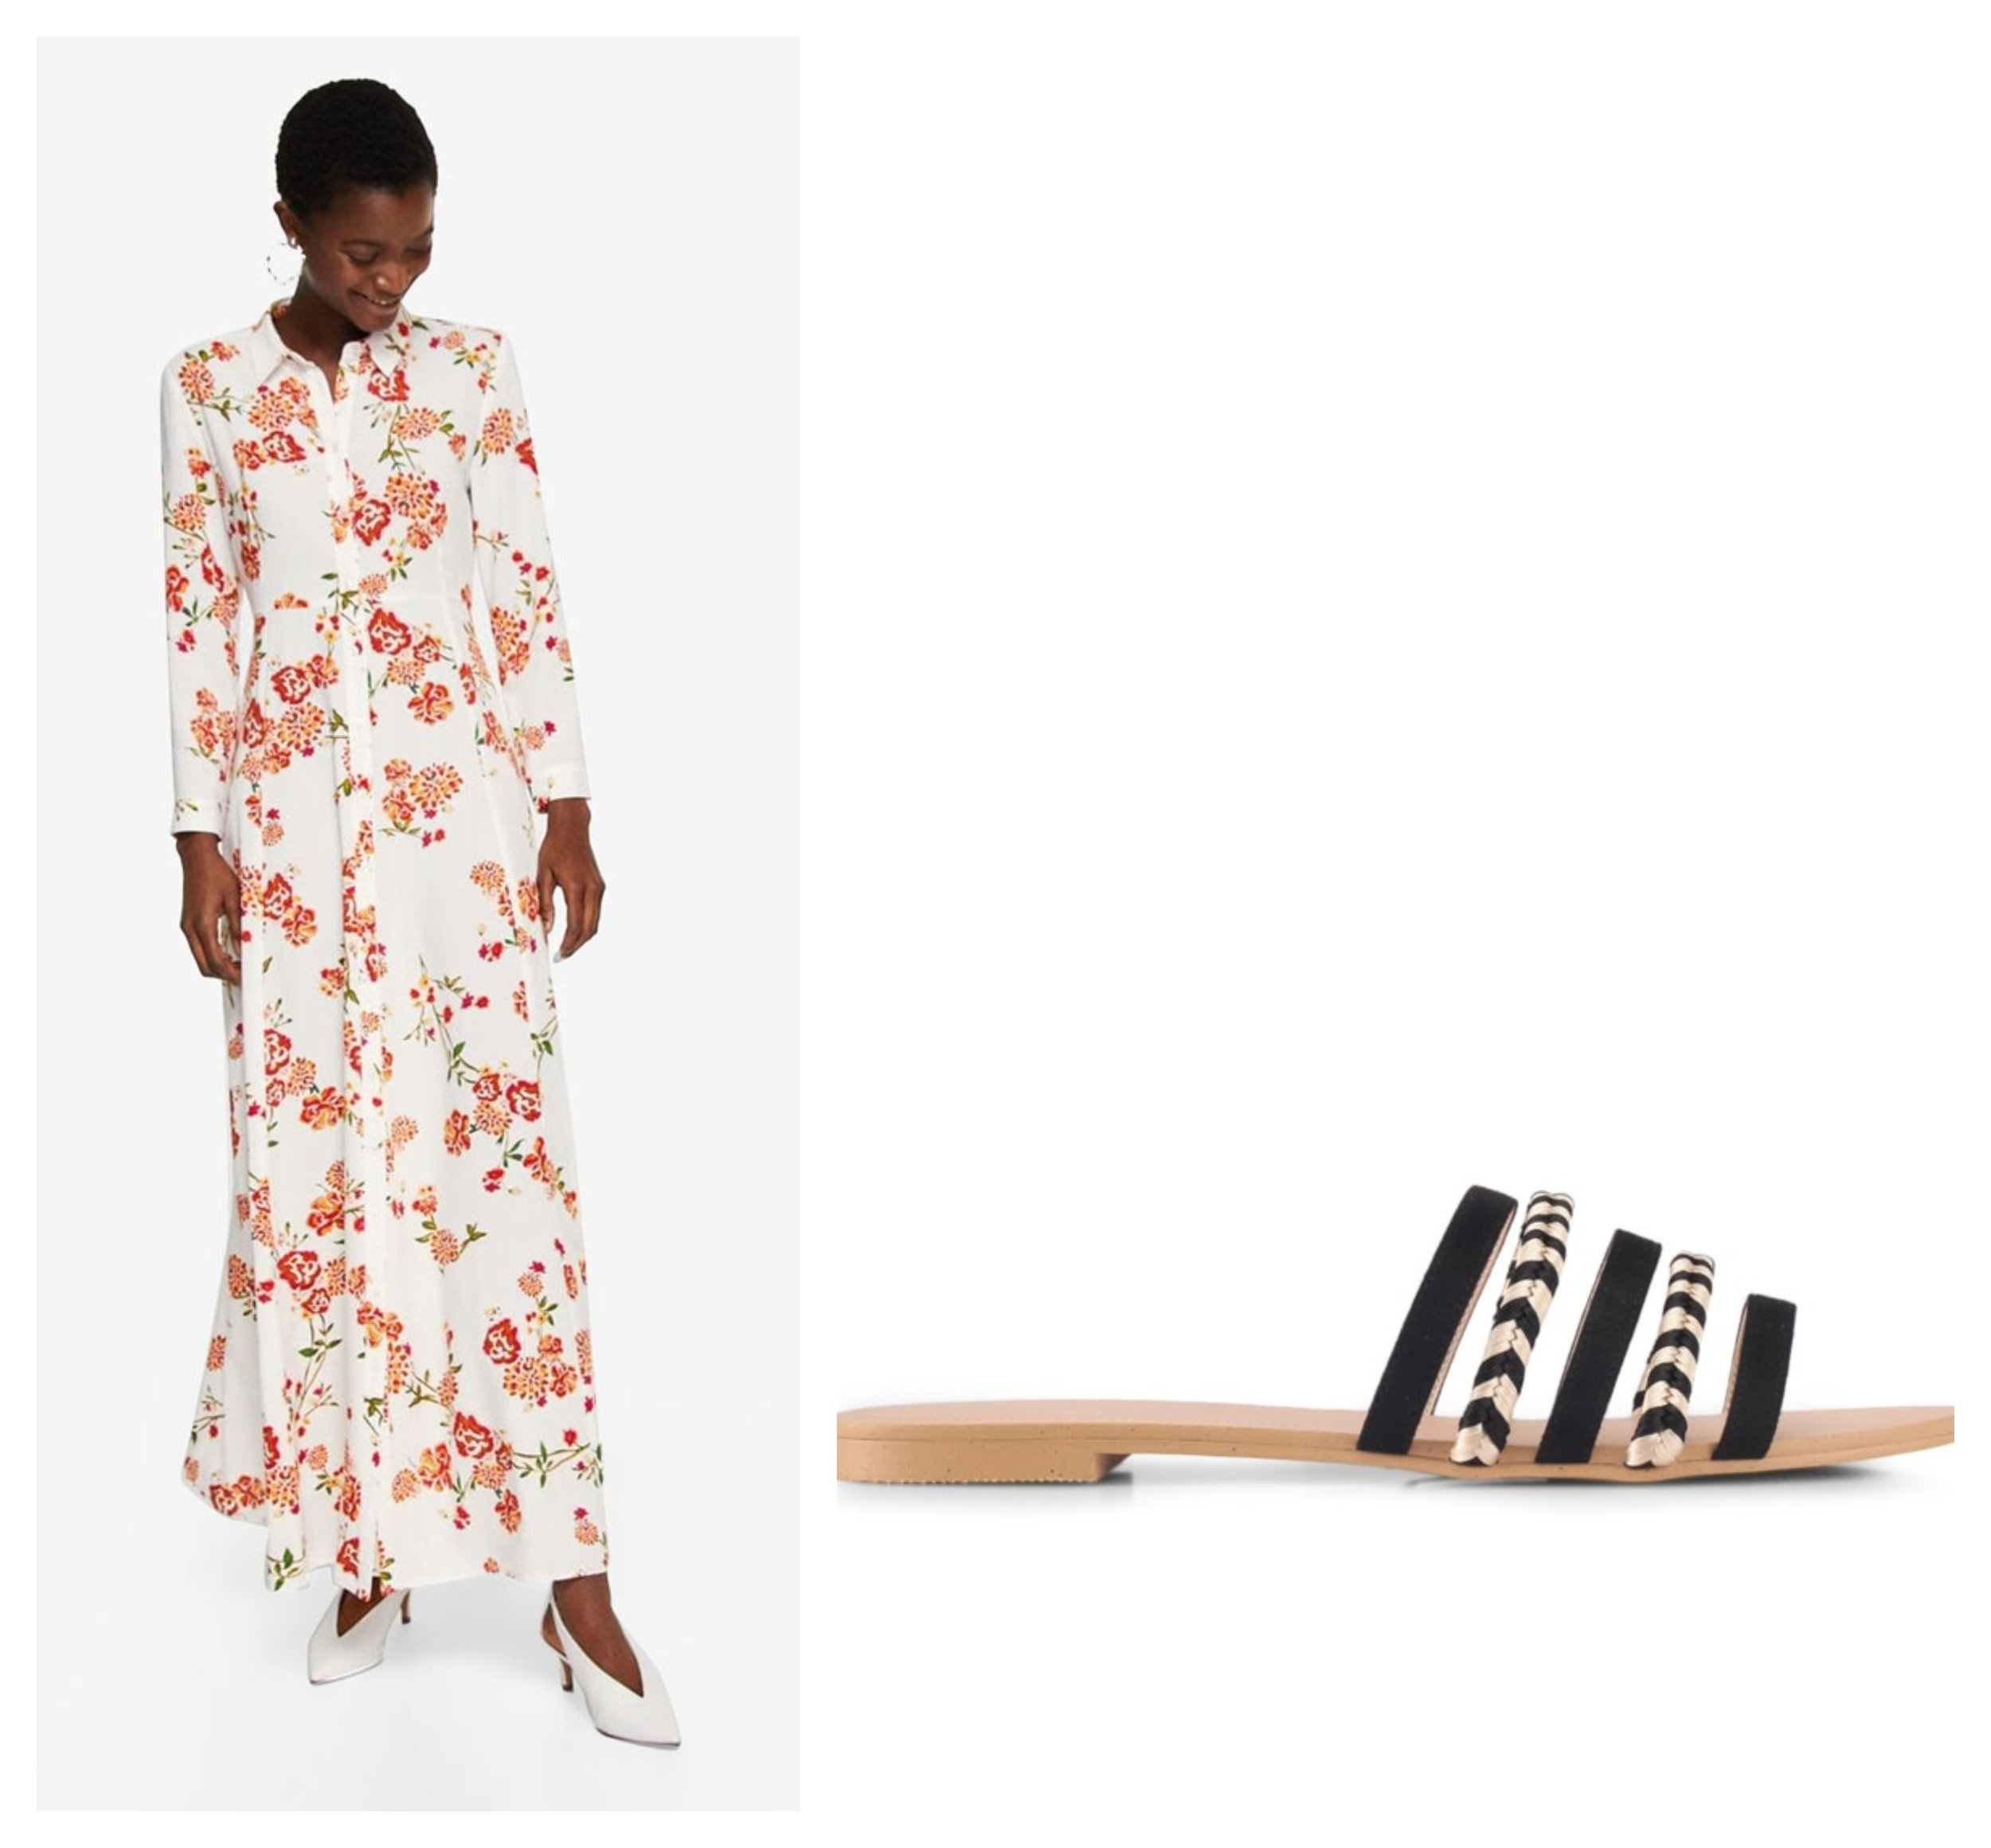 MANGO Floral Print Long Dress  I  ZALORA Multi Front Straps Sliders